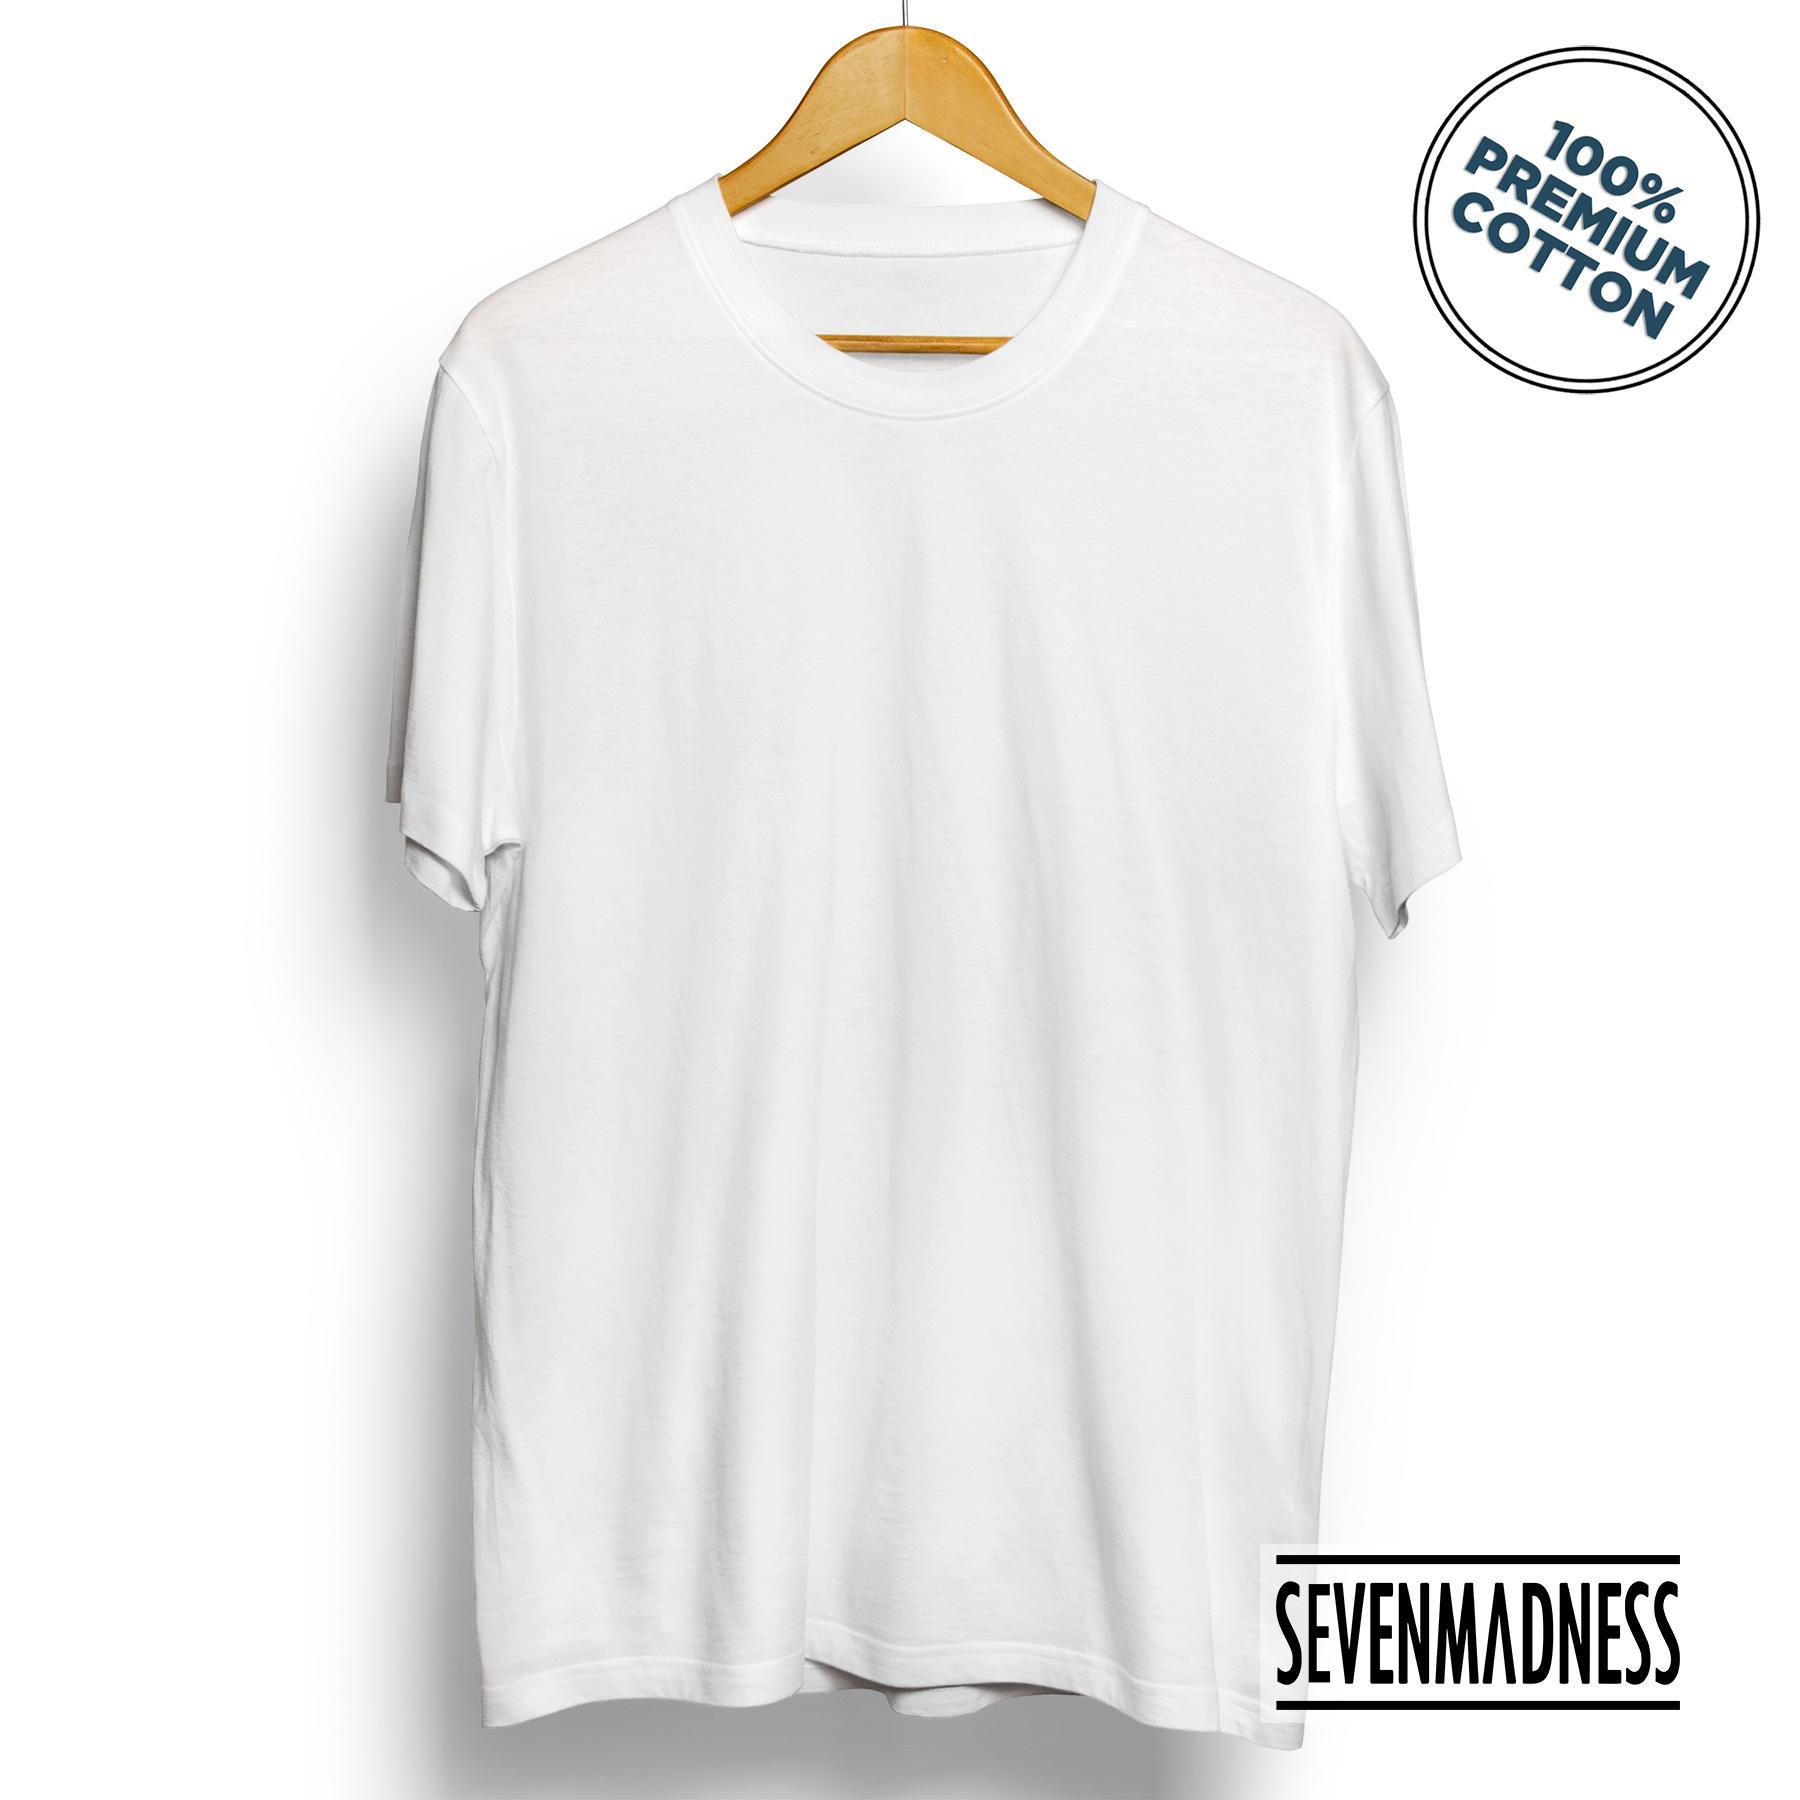 Kaos Polos Unisex Pria / Wanita - Premium Cotton Combed Tshirt